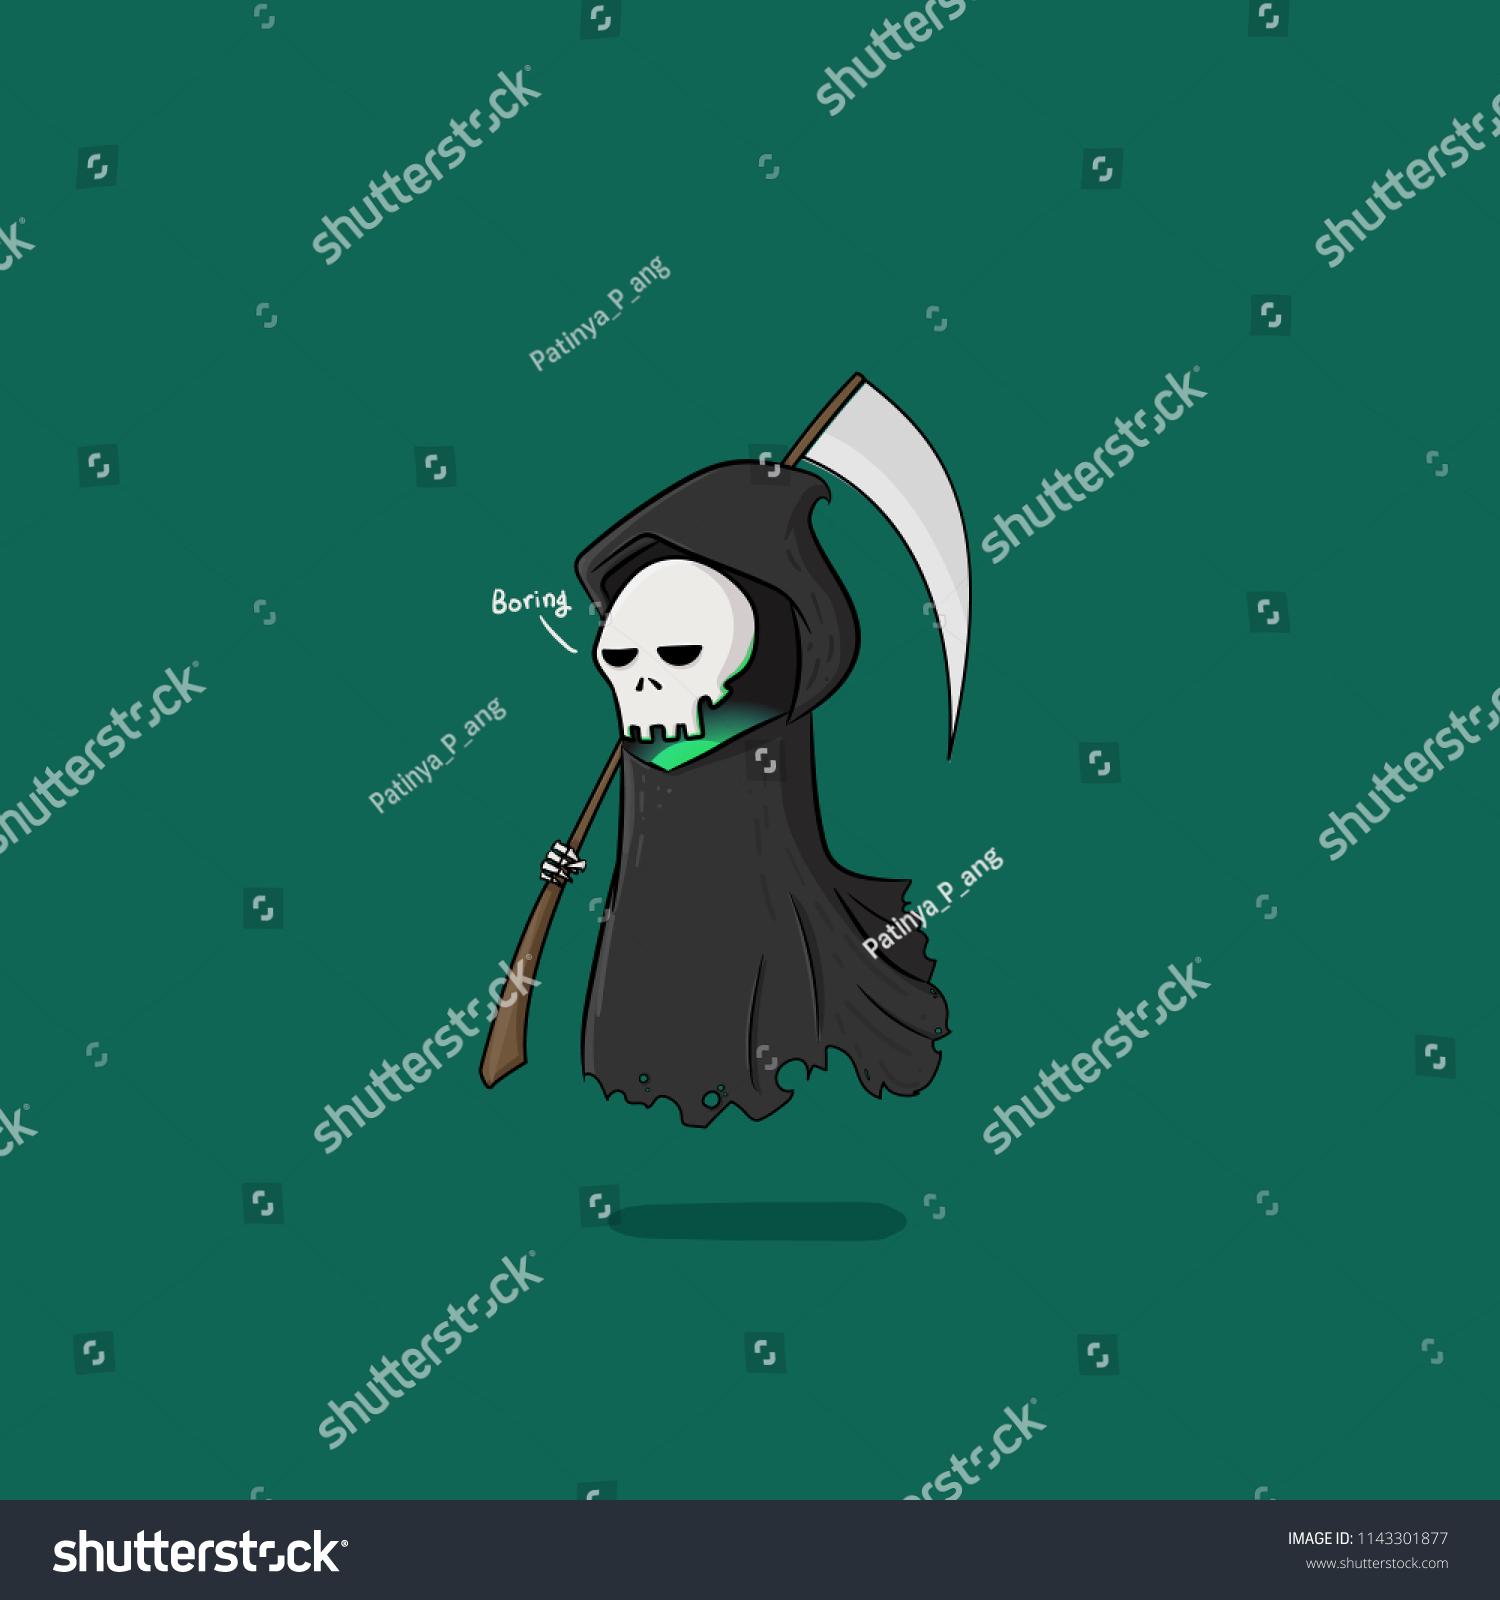 Hand Draw Boring Reaper Scythe Cartoon Stock Vector Royalty Free